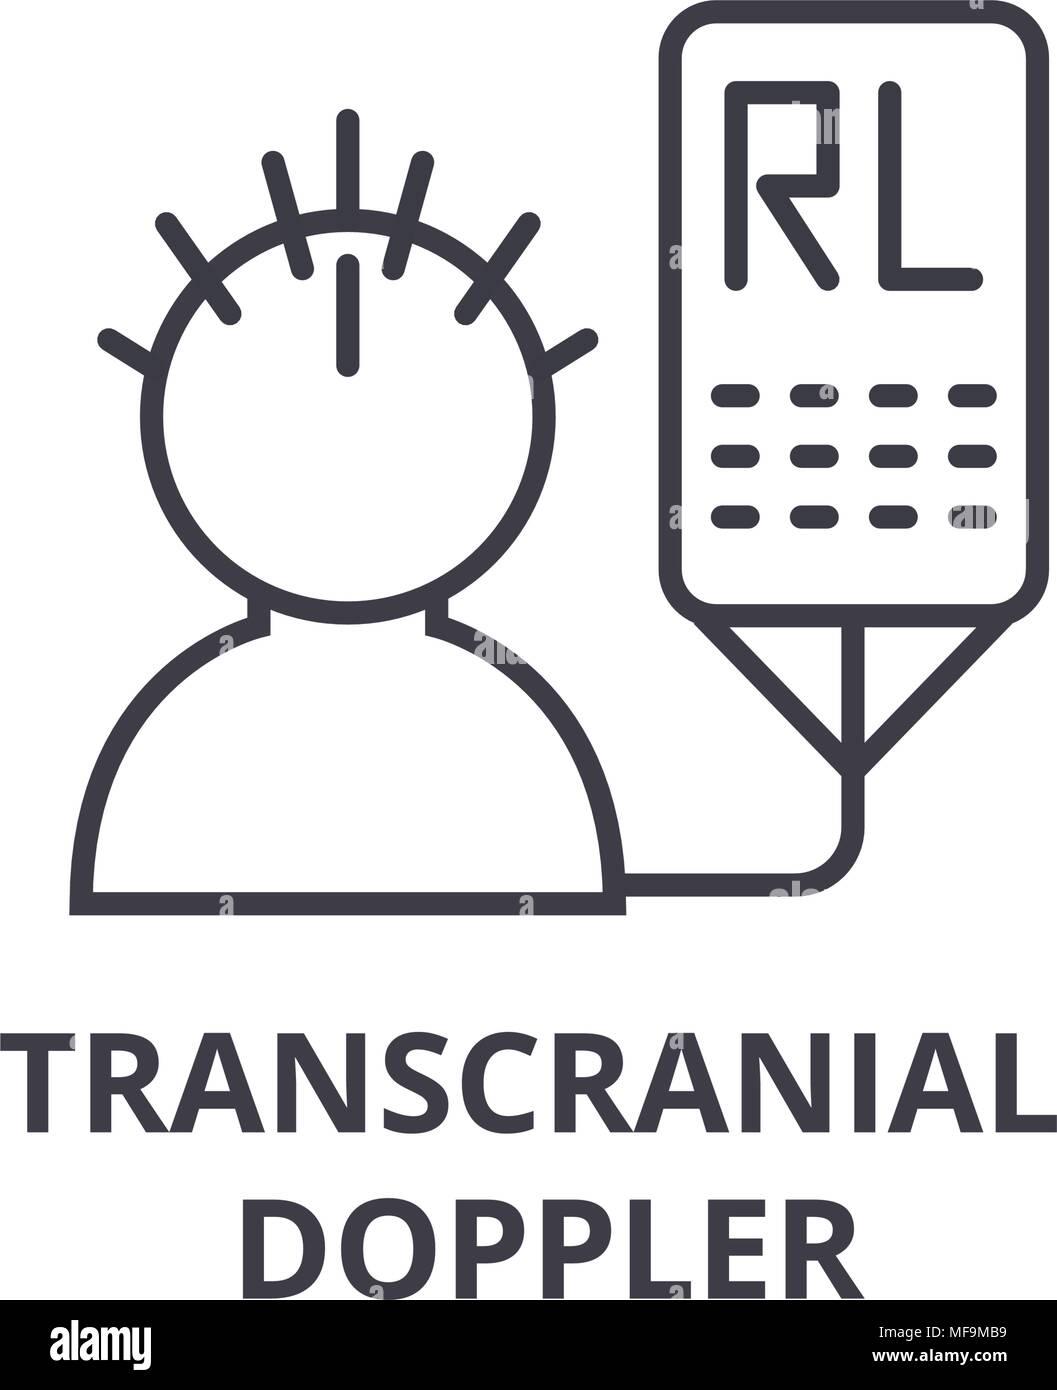 transcranial doppler thin line icon, sign, symbol, illustation, linear concept, vector  - Stock Vector